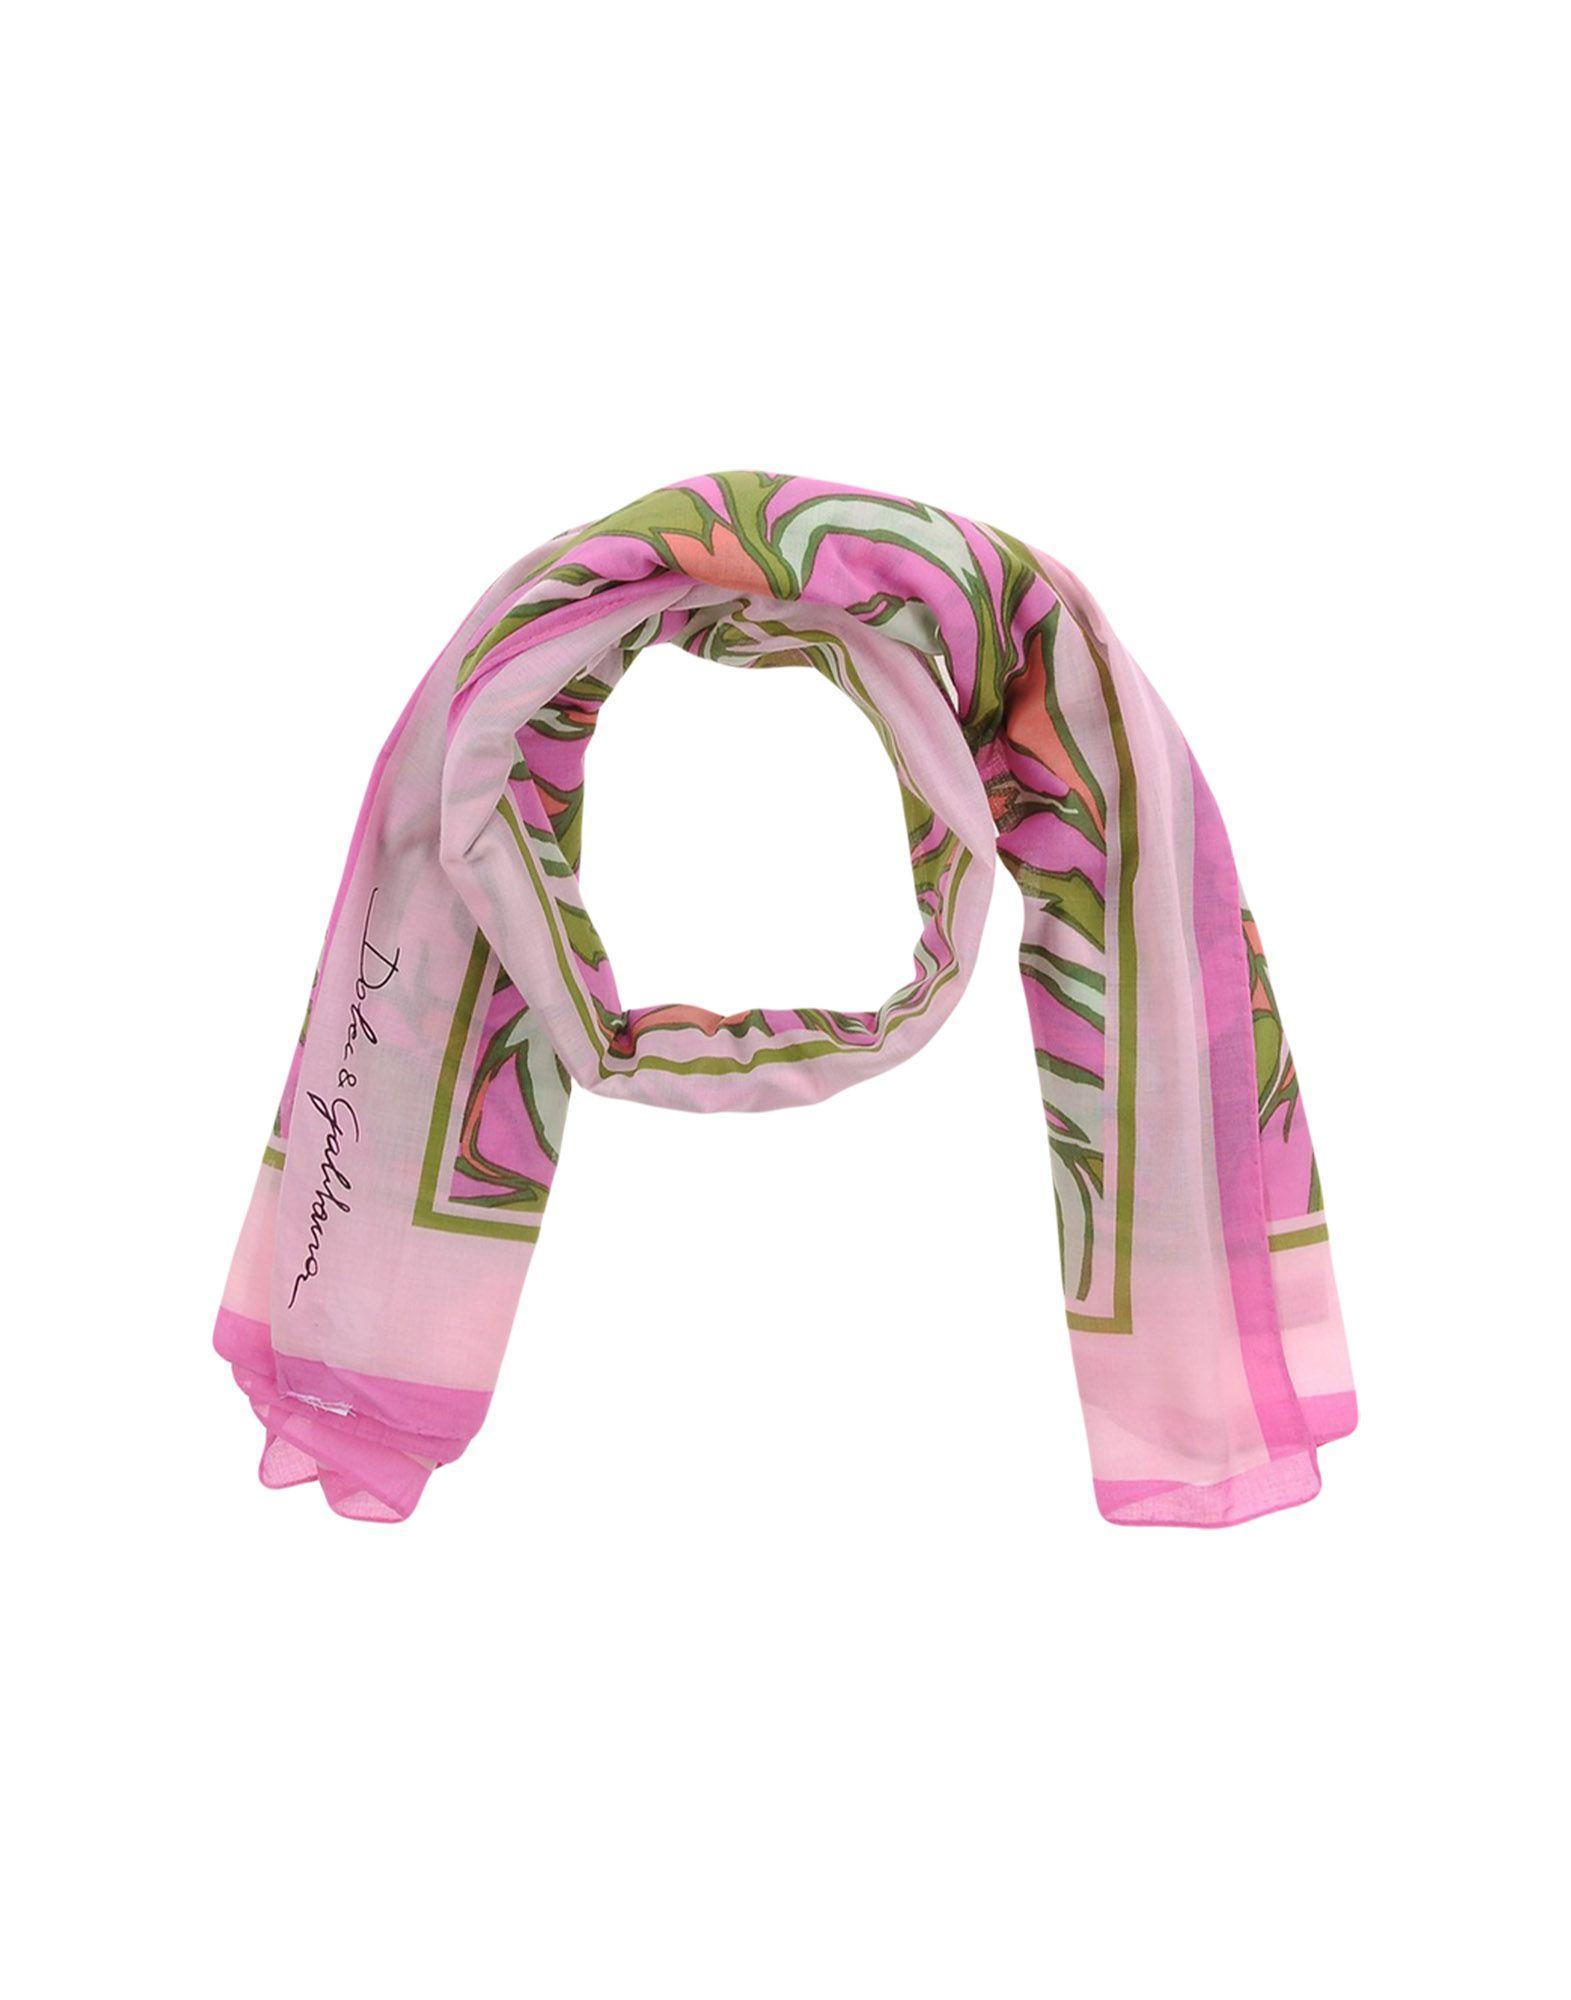 Dolce Amp Gabbana Scarf In Pink Lyst